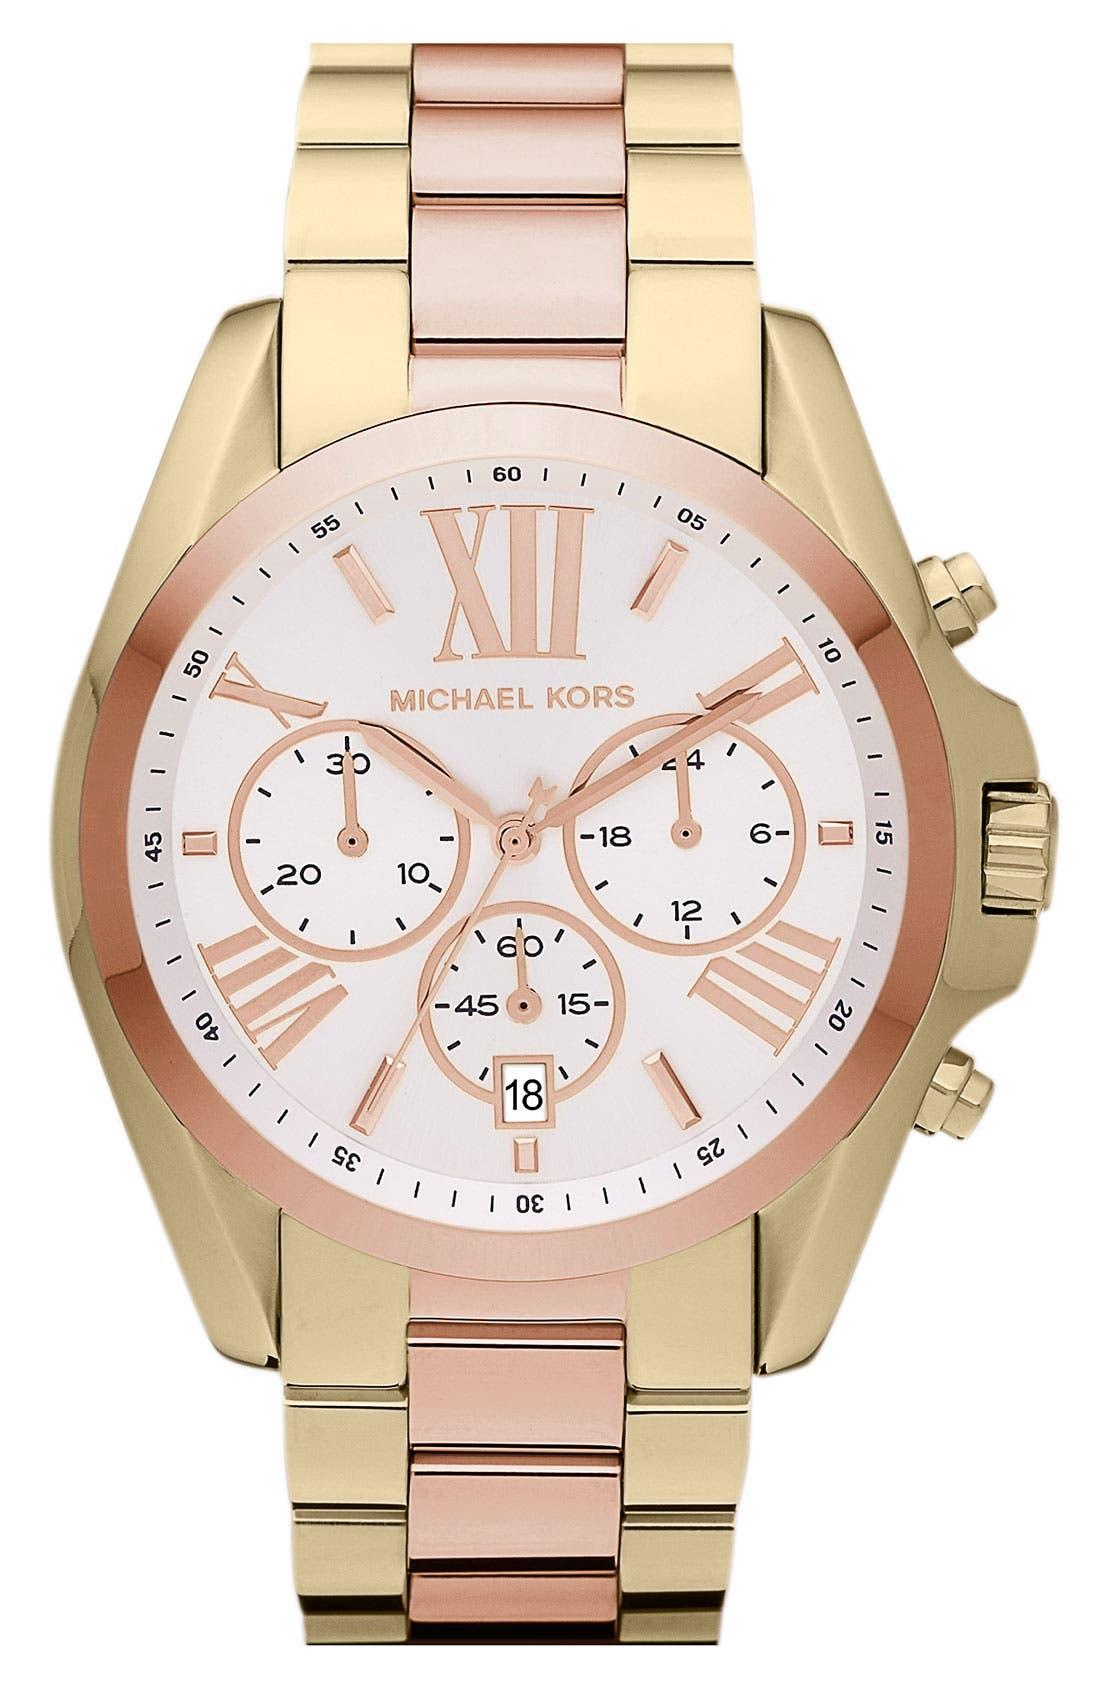 Main Image - Michael Kors 'Bradshaw' Chronograph Bracelet Watch, 43mm